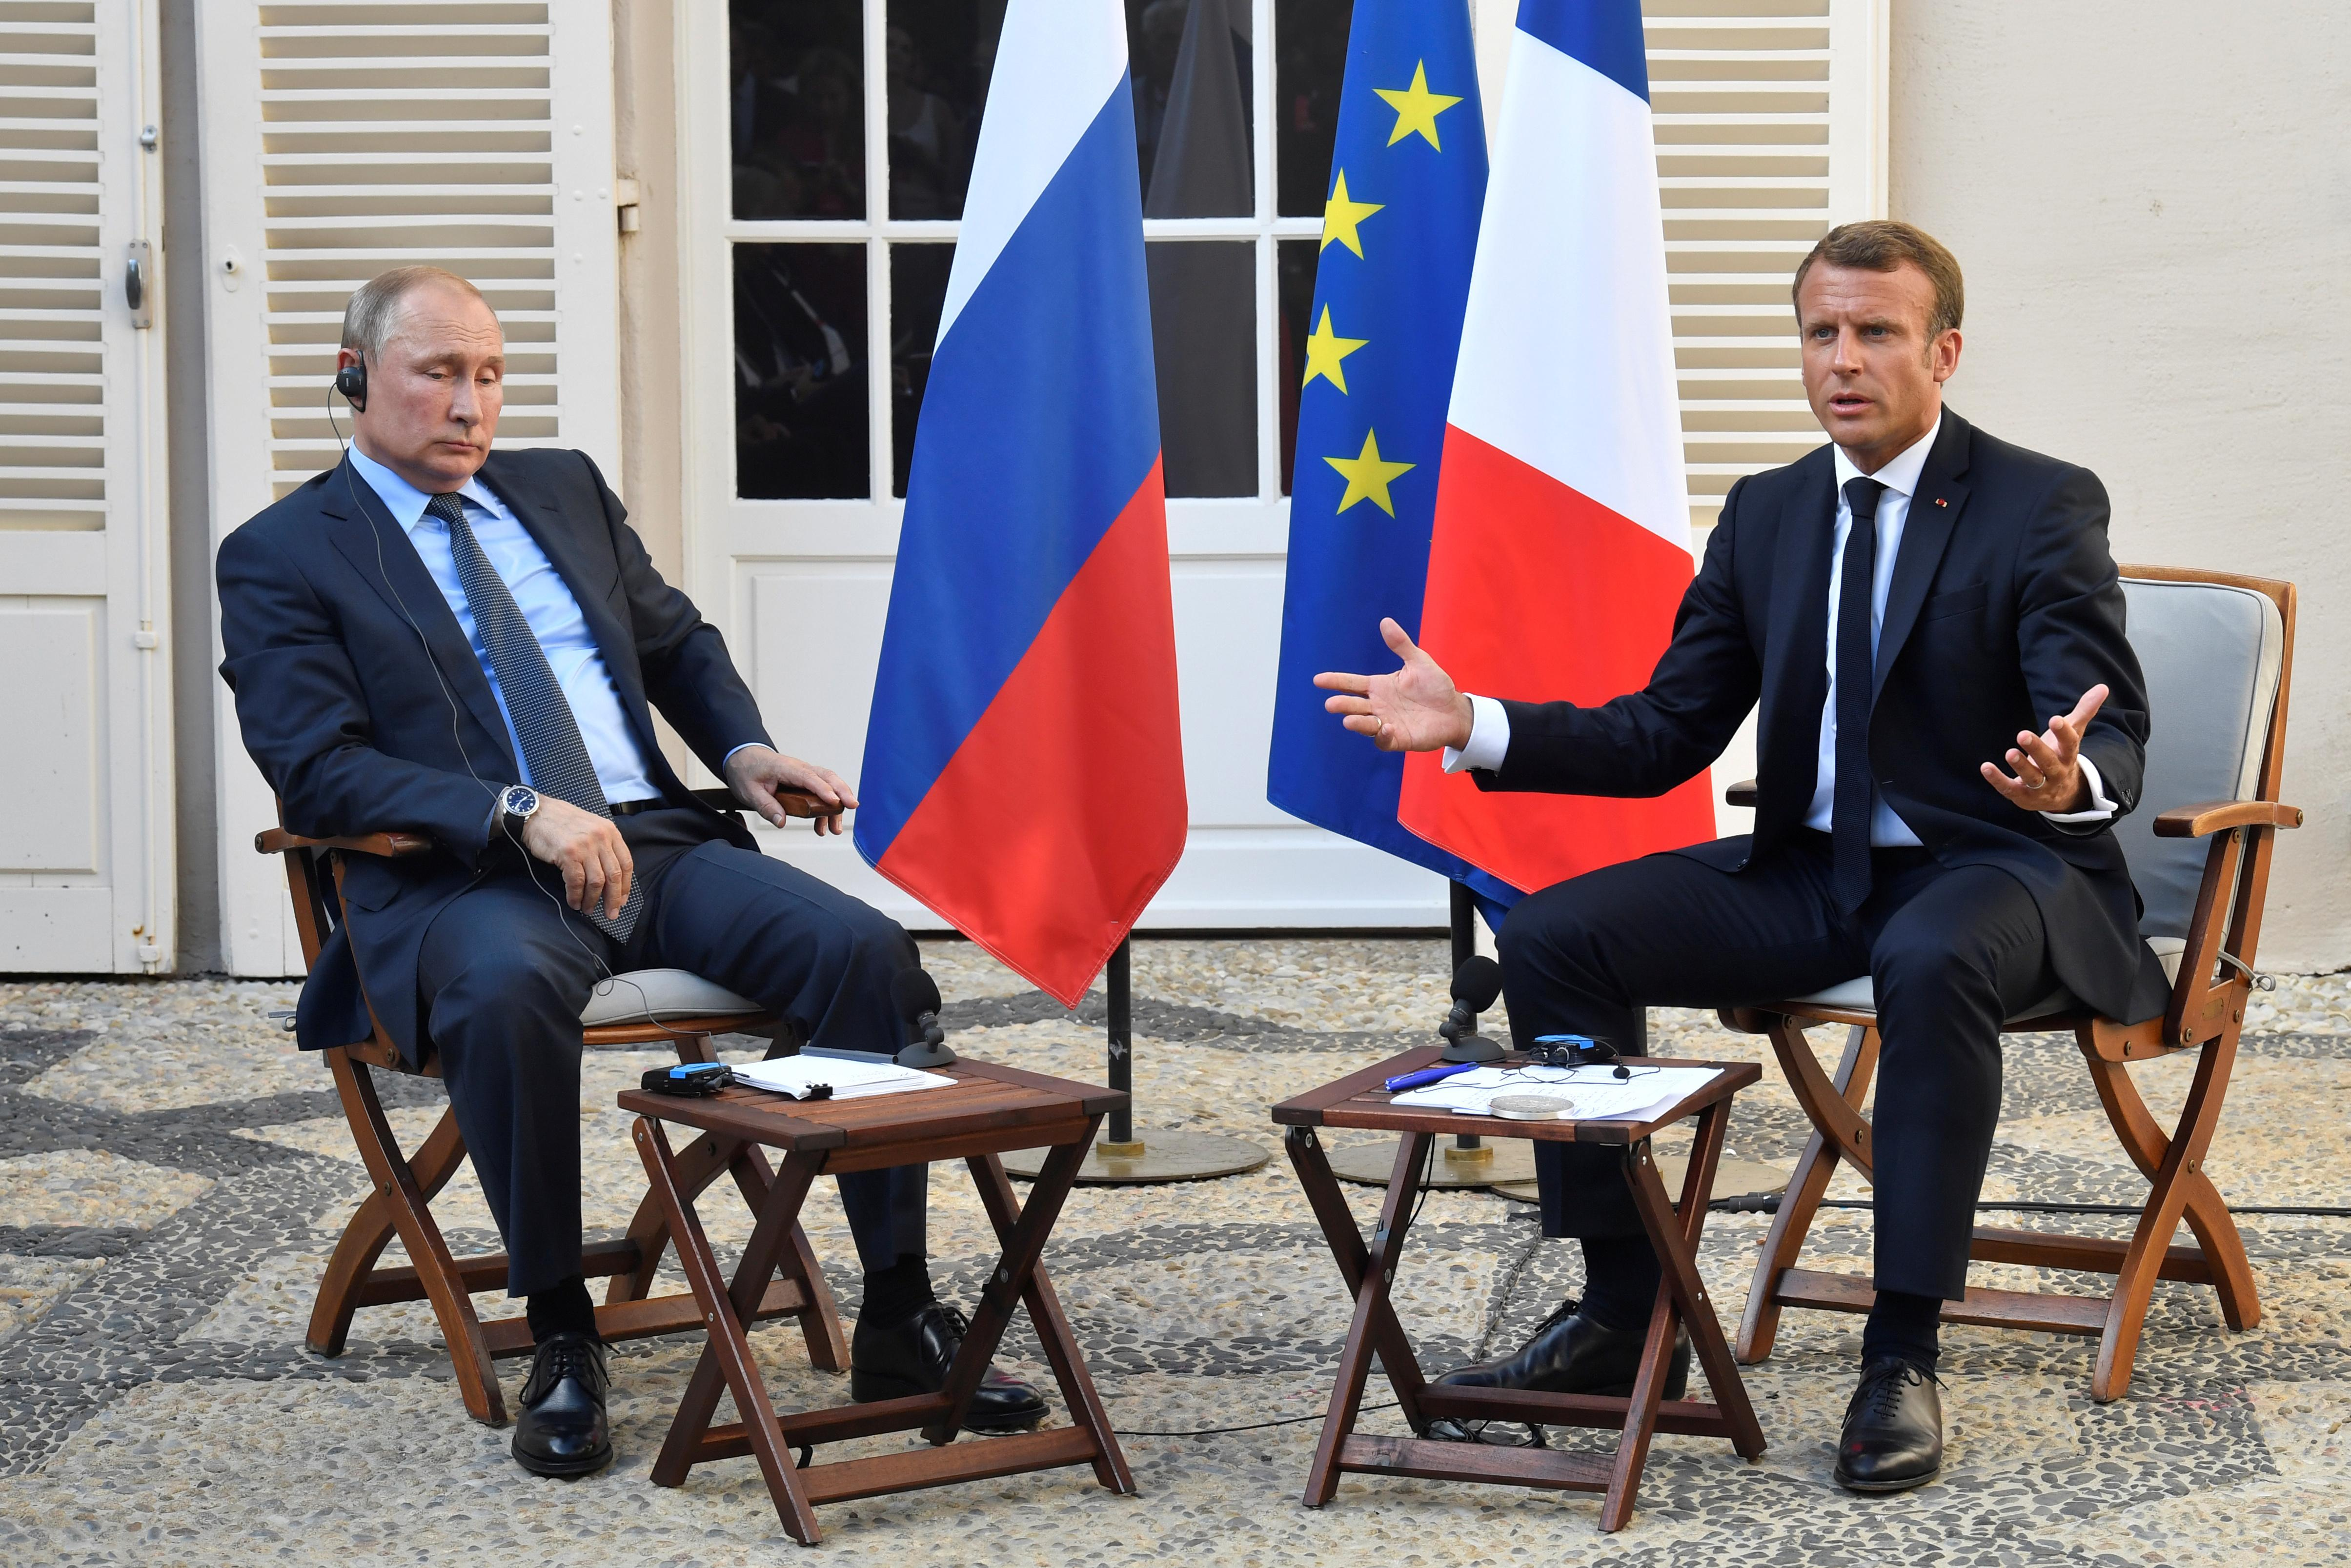 Putin, Macron discussed Syria, Ukraine by phone: Kremlin